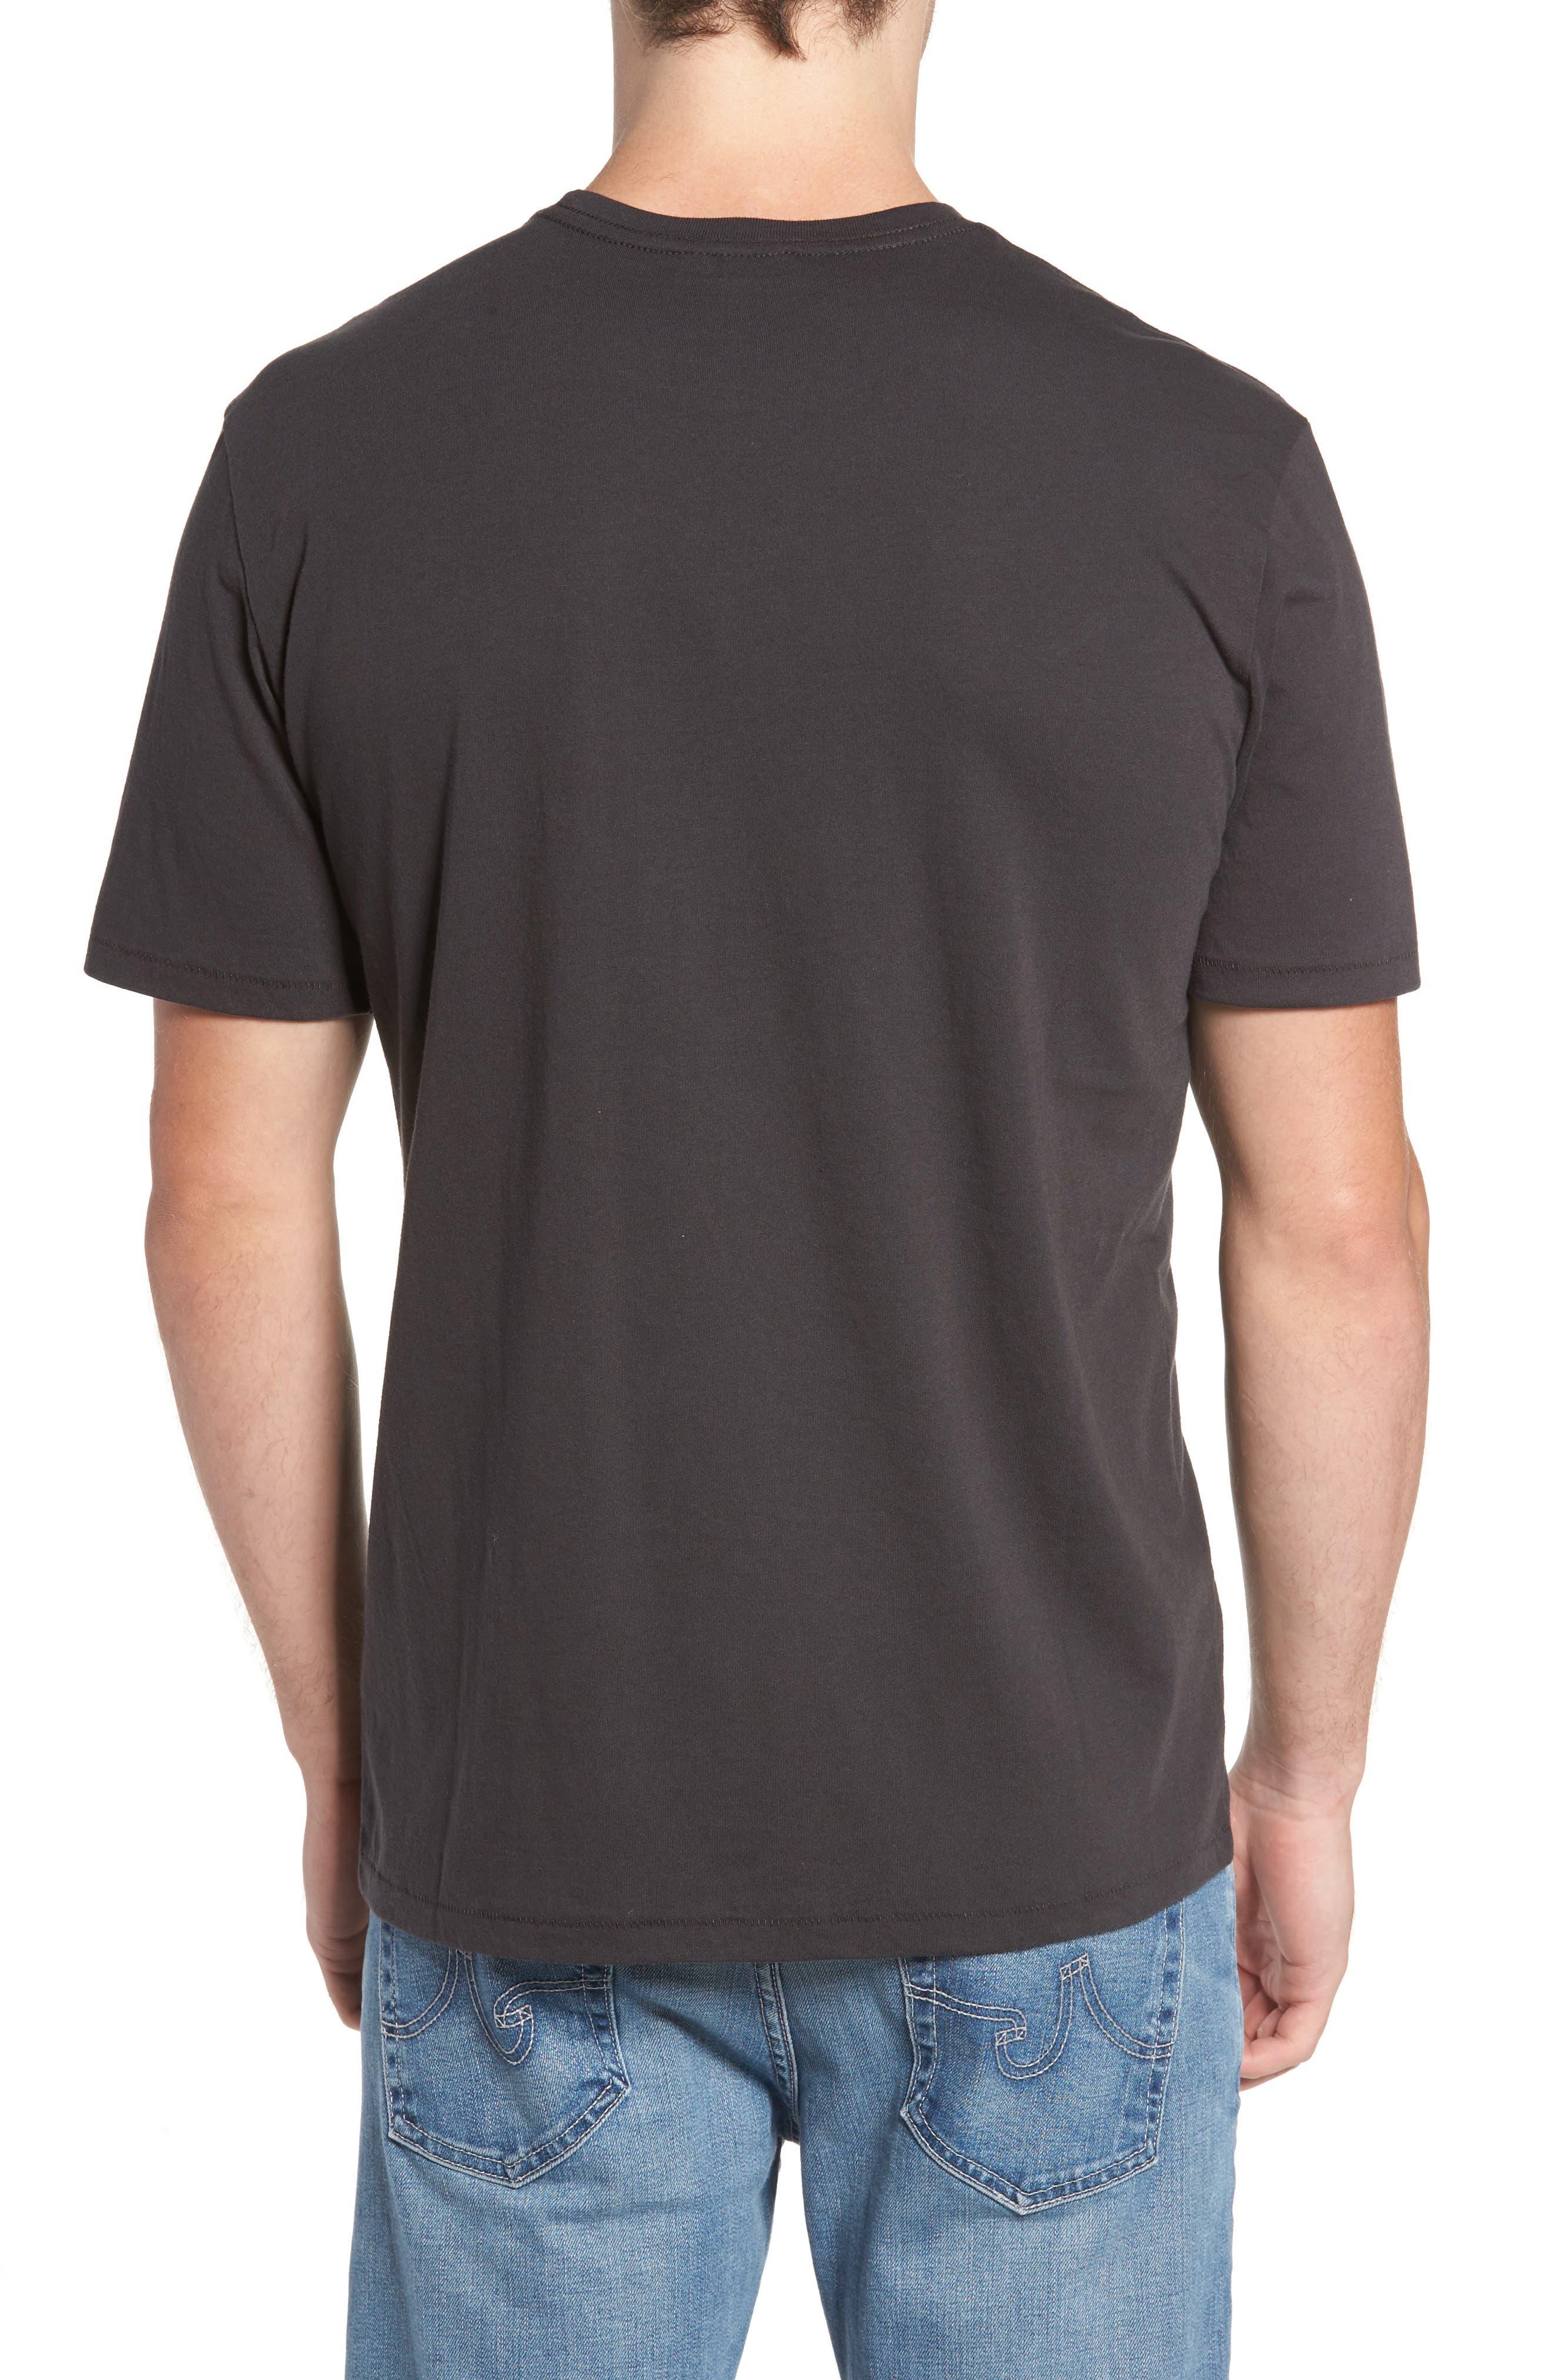 Broadcast T-Shirt,                             Alternate thumbnail 2, color,                             Washed Black